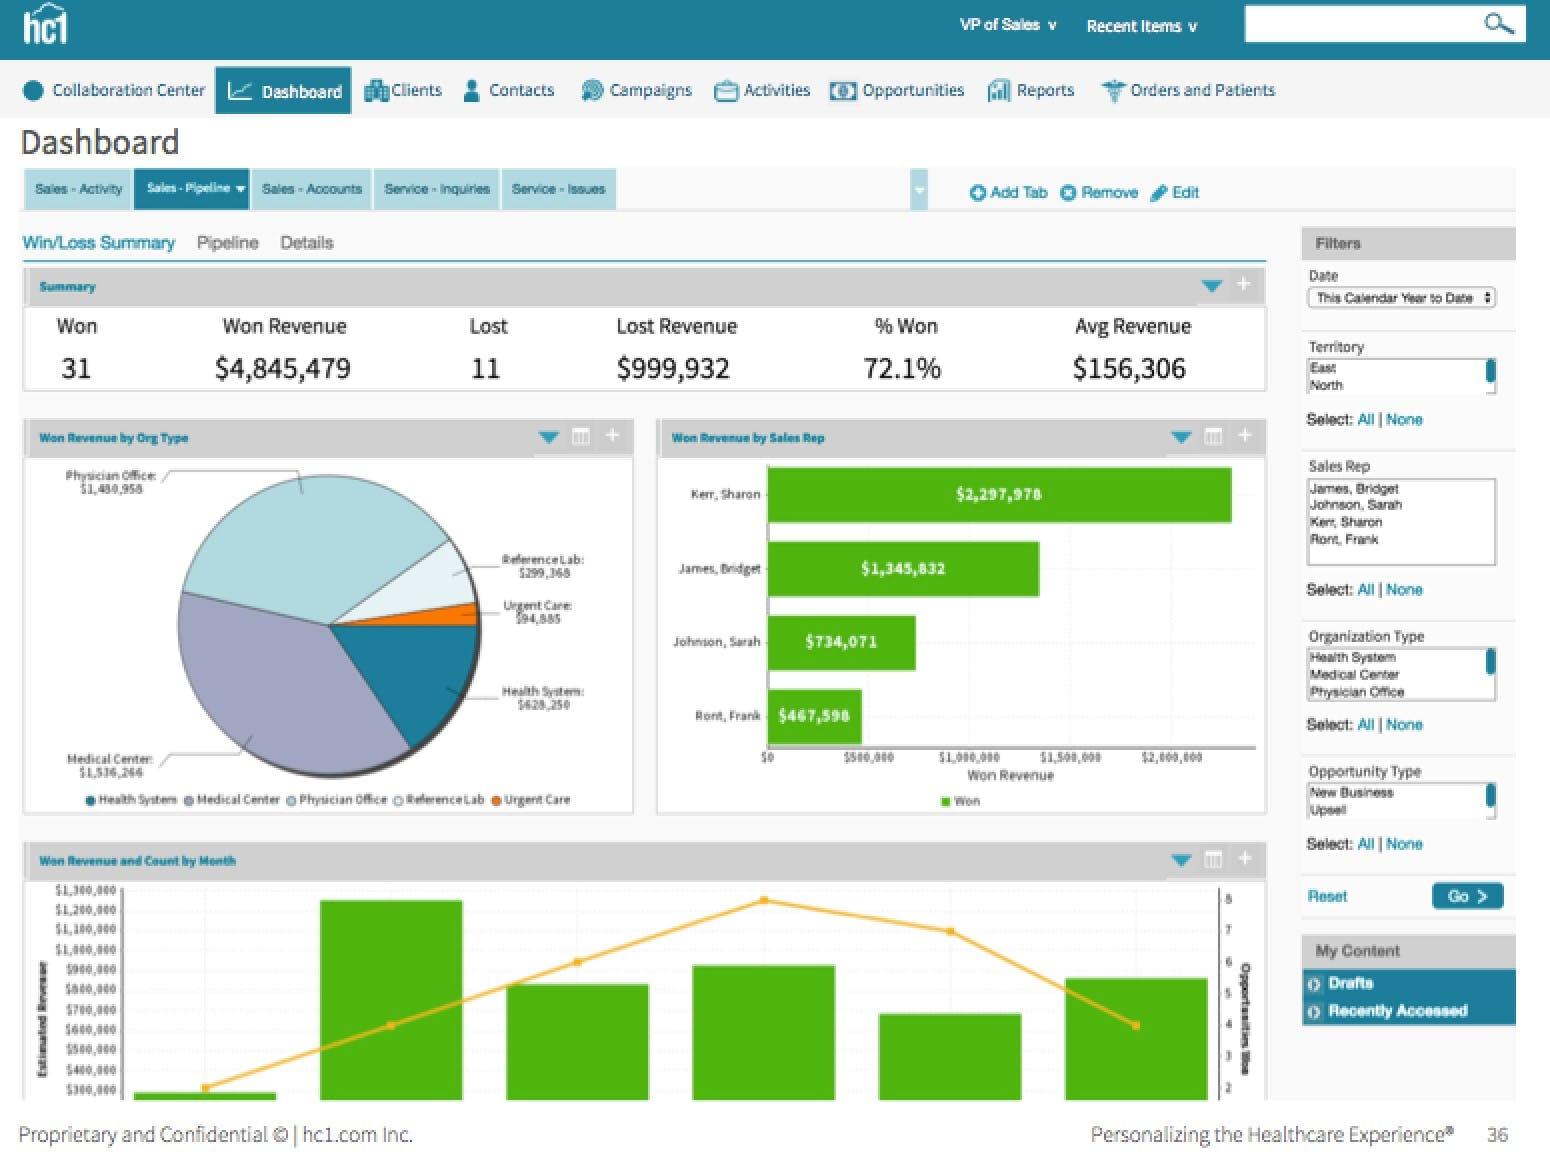 hc1 High-Value Care Platform Software - Sales pipeline overview %>